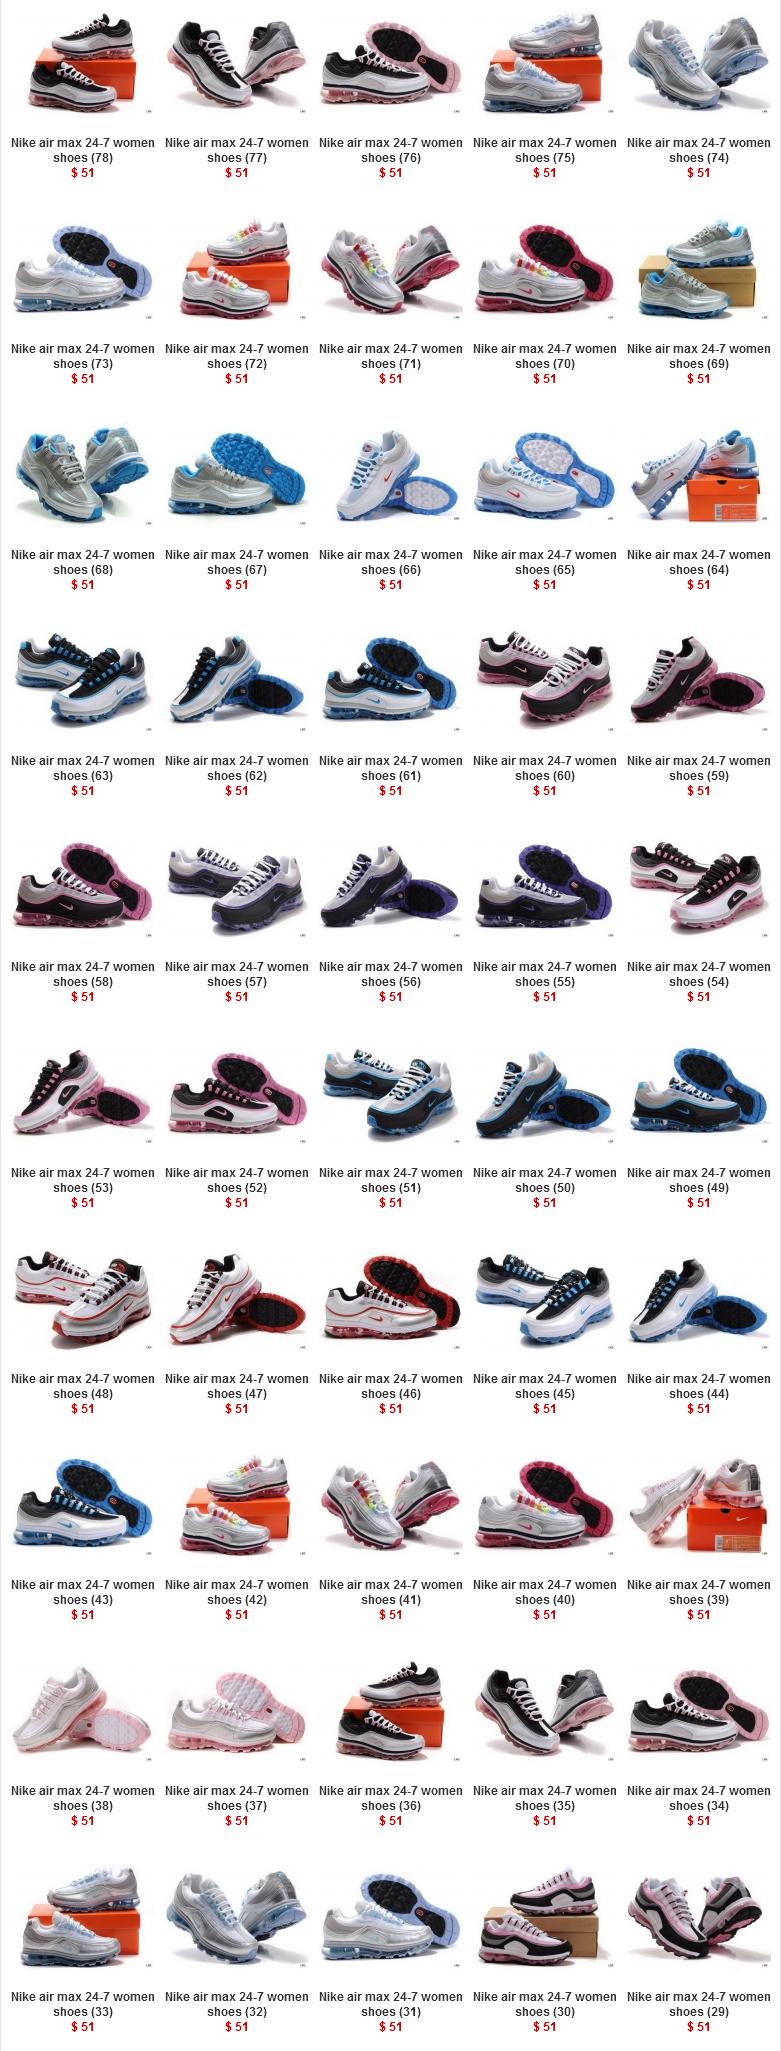 super popular 593b2 2d14b Nike Air Max 24-7 Women Shoes Page 1